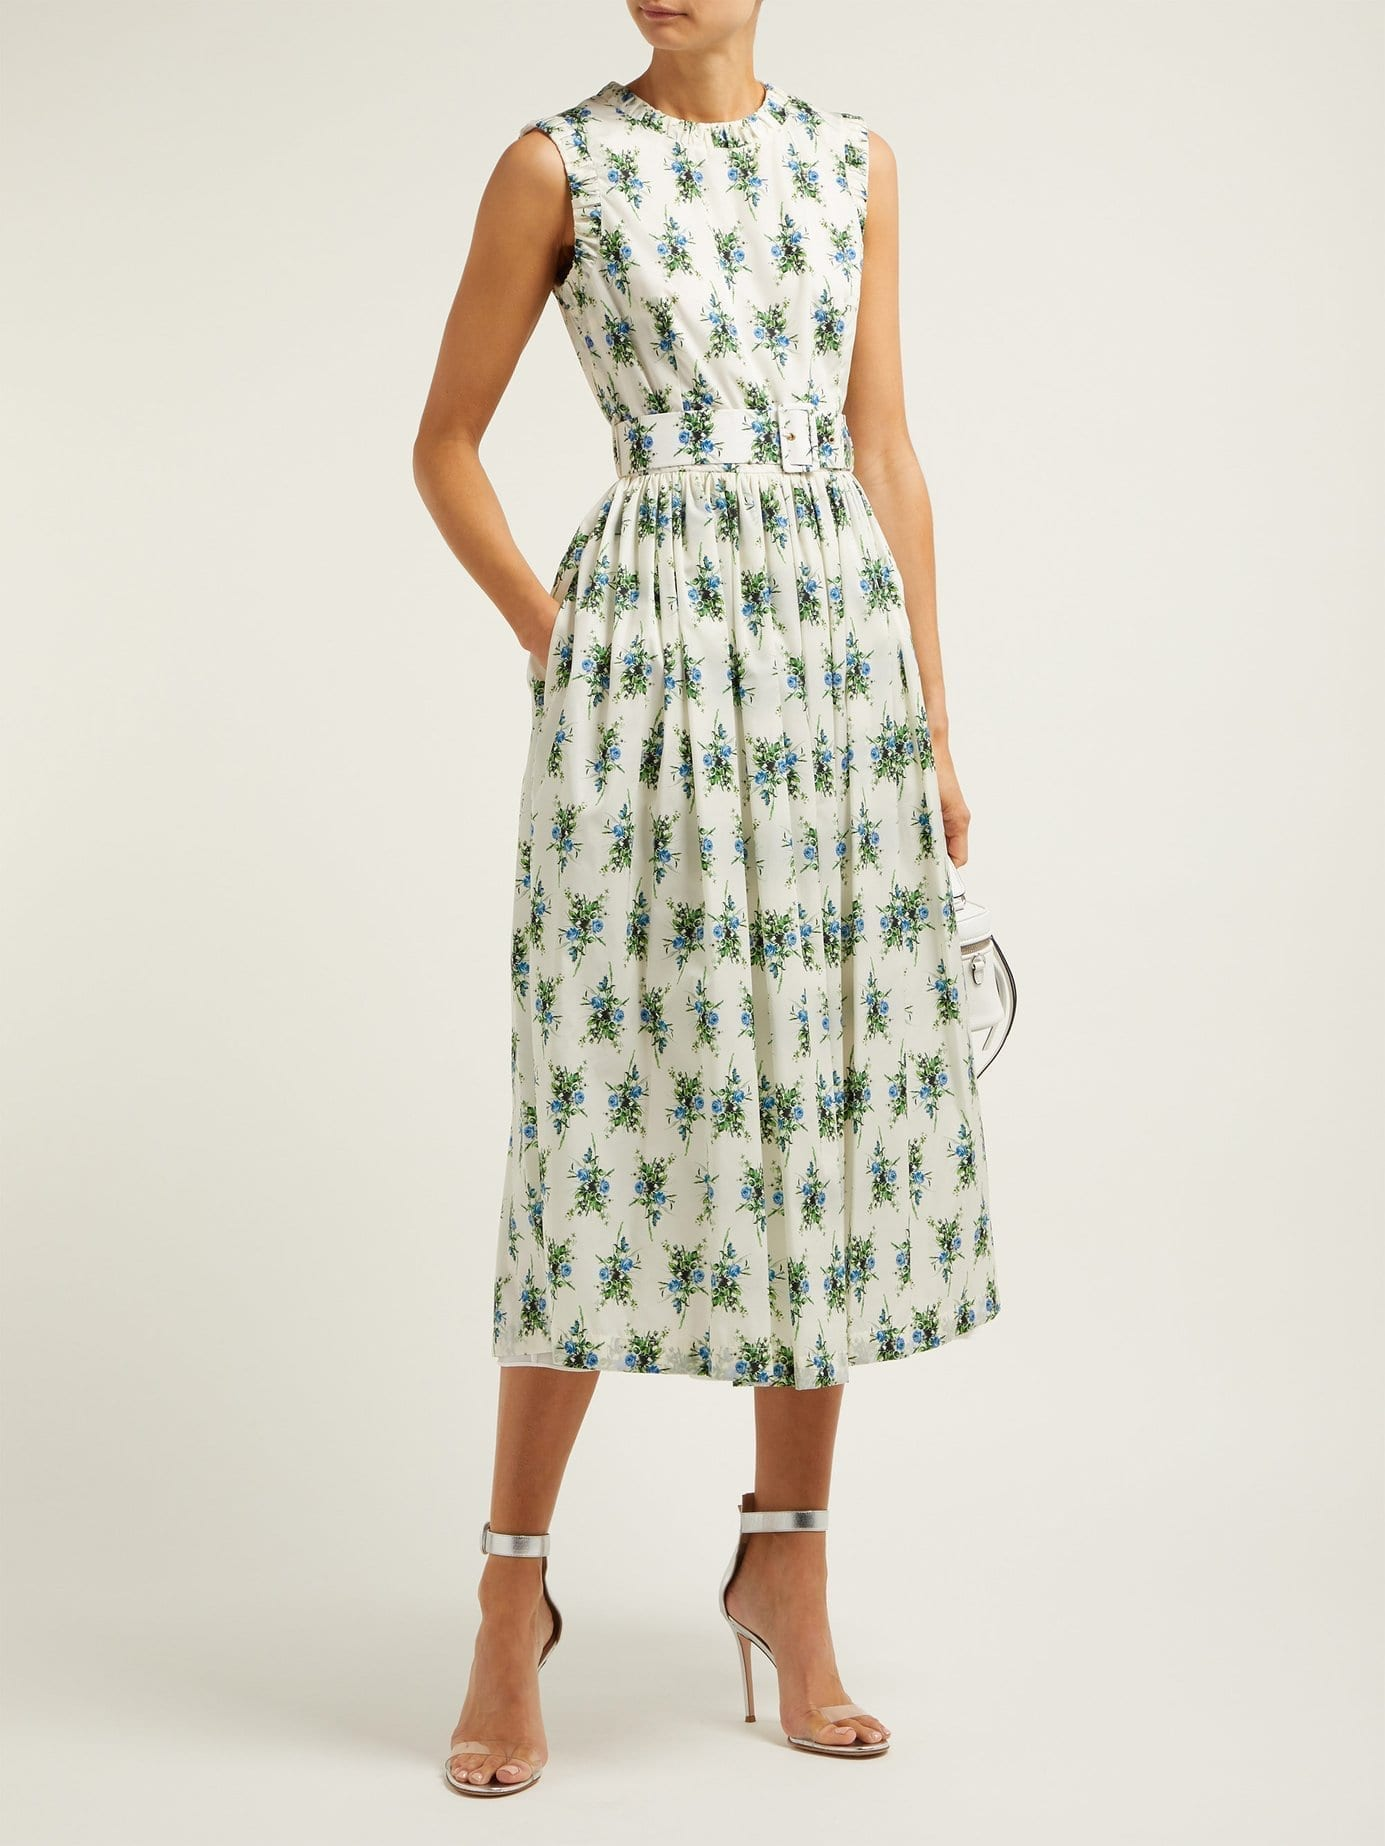 EMILIA WICKSTEAD Maidy Rubberised Midi White / Floral Printed Dress